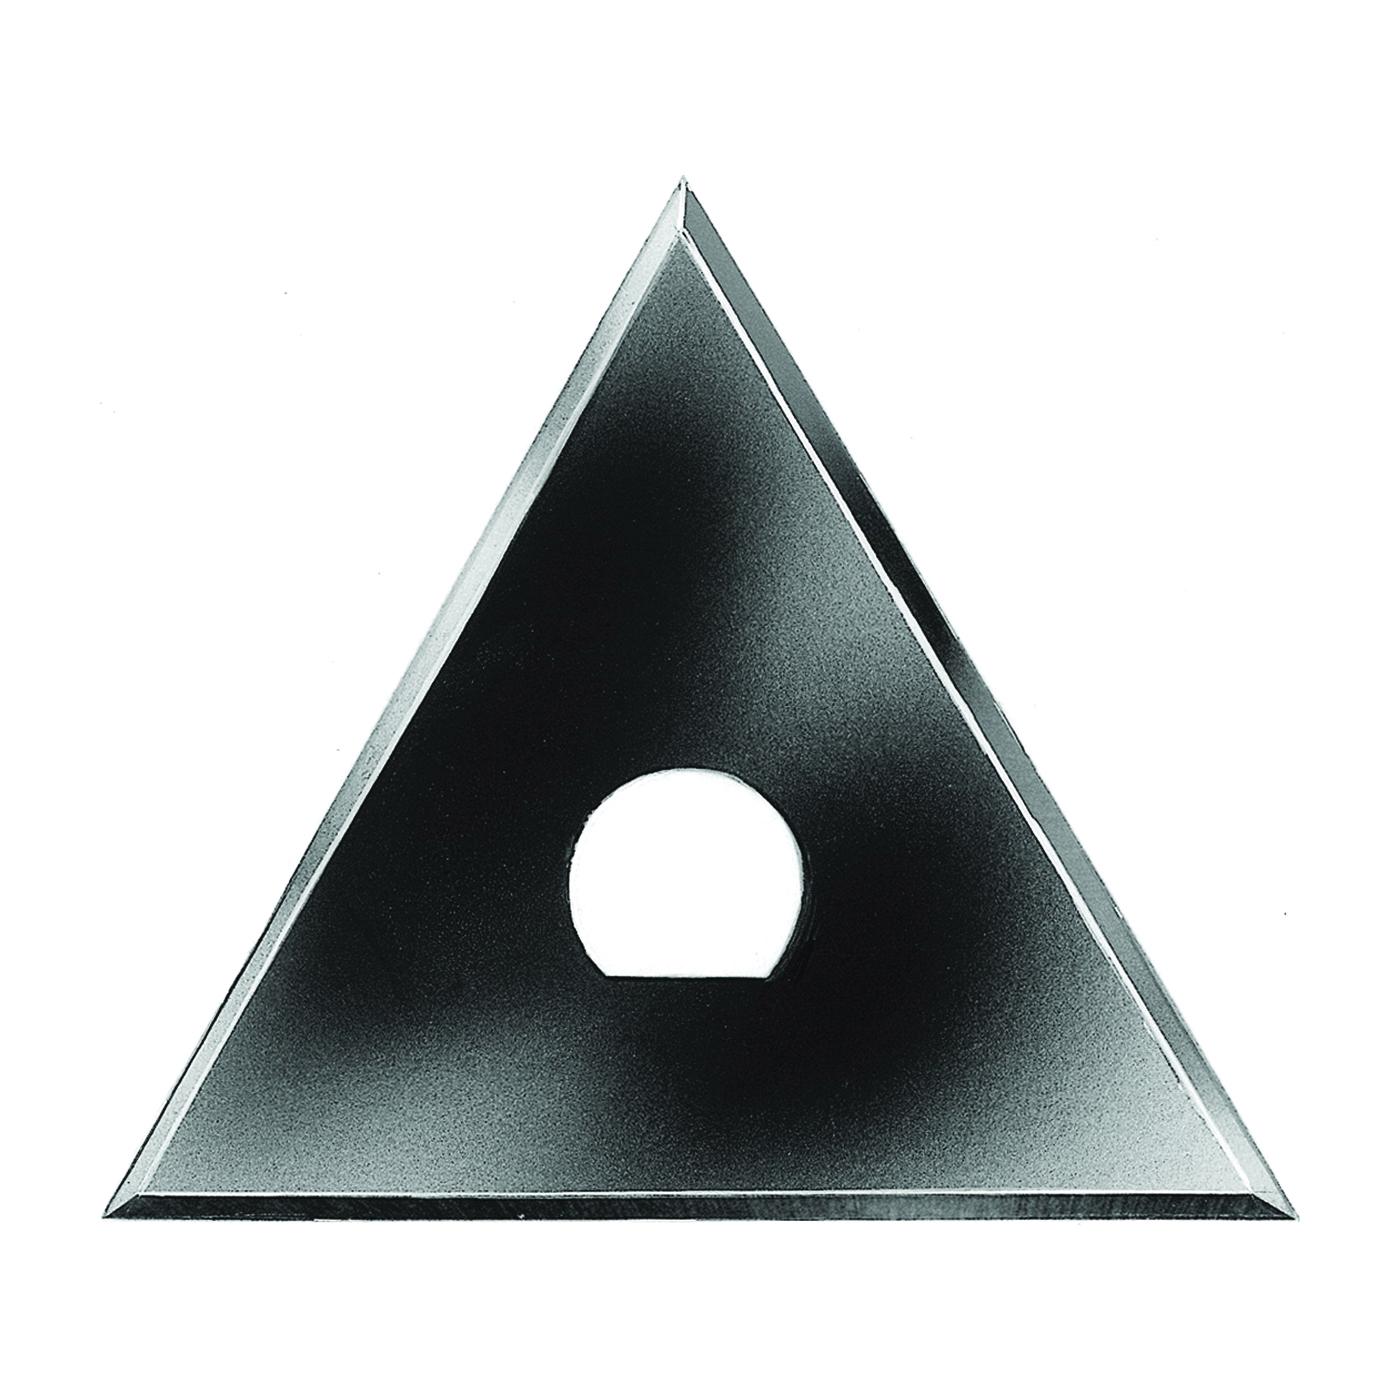 Picture of HYDE 10420 Scraper Blade, Triangular Blade, 2-1/4 in W Blade, Carbon Steel Blade